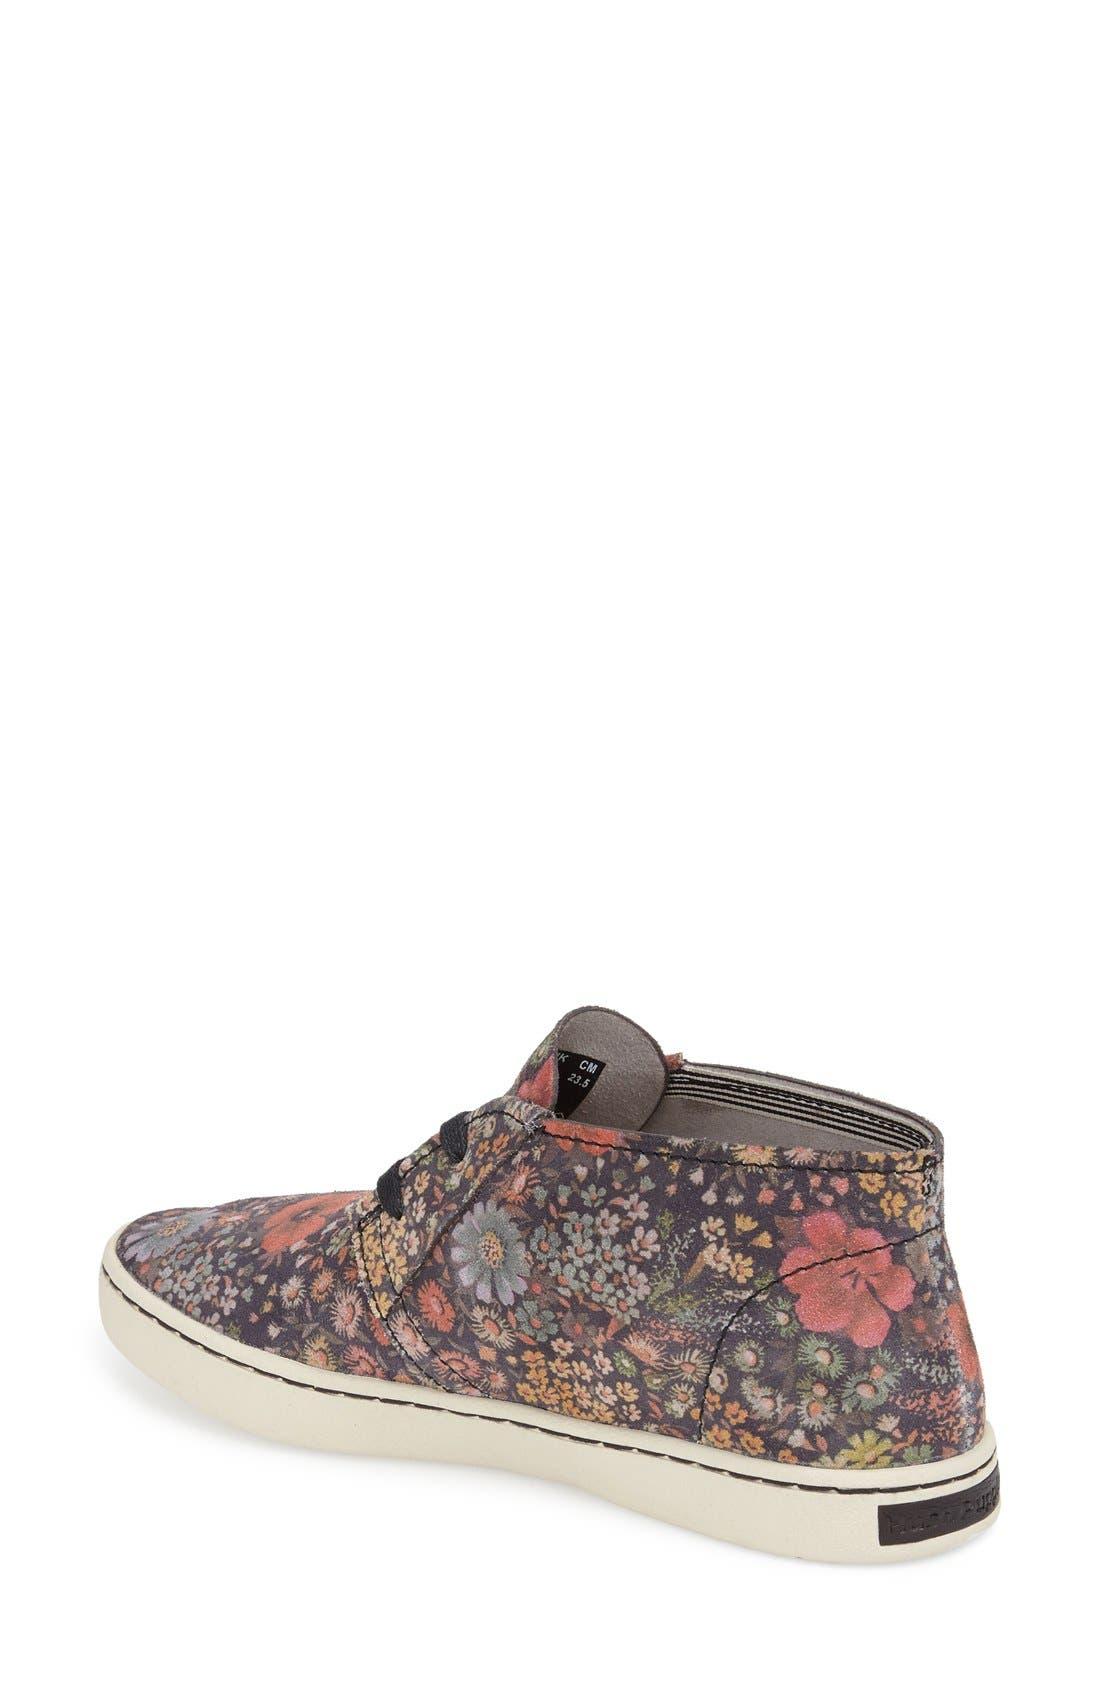 'Cille Gwen' Sneaker,                             Alternate thumbnail 7, color,